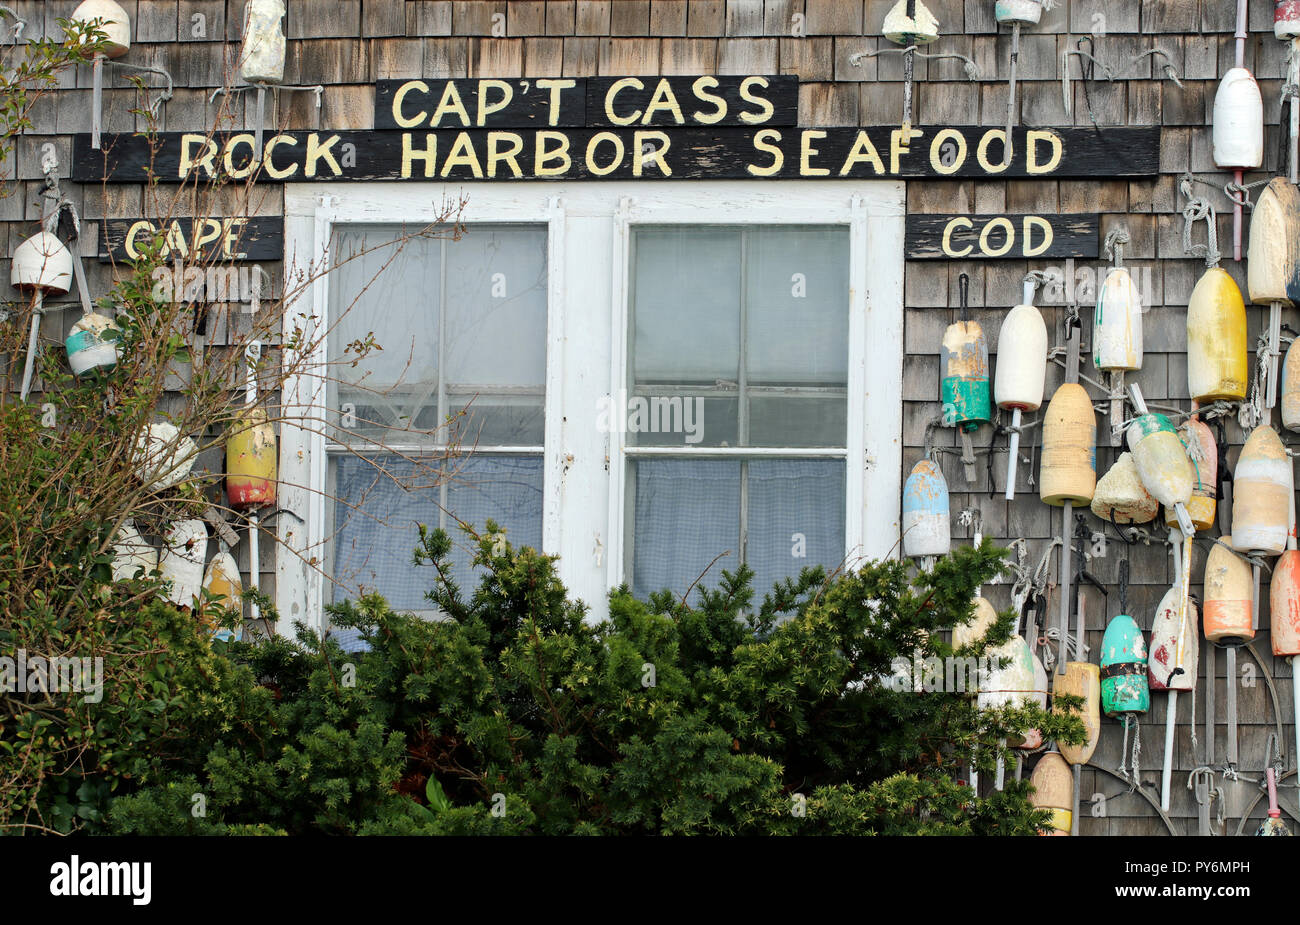 Cap't Cass Rock Harbor Seafood Restaurant, Orleans, Massachusetts Stock Photo